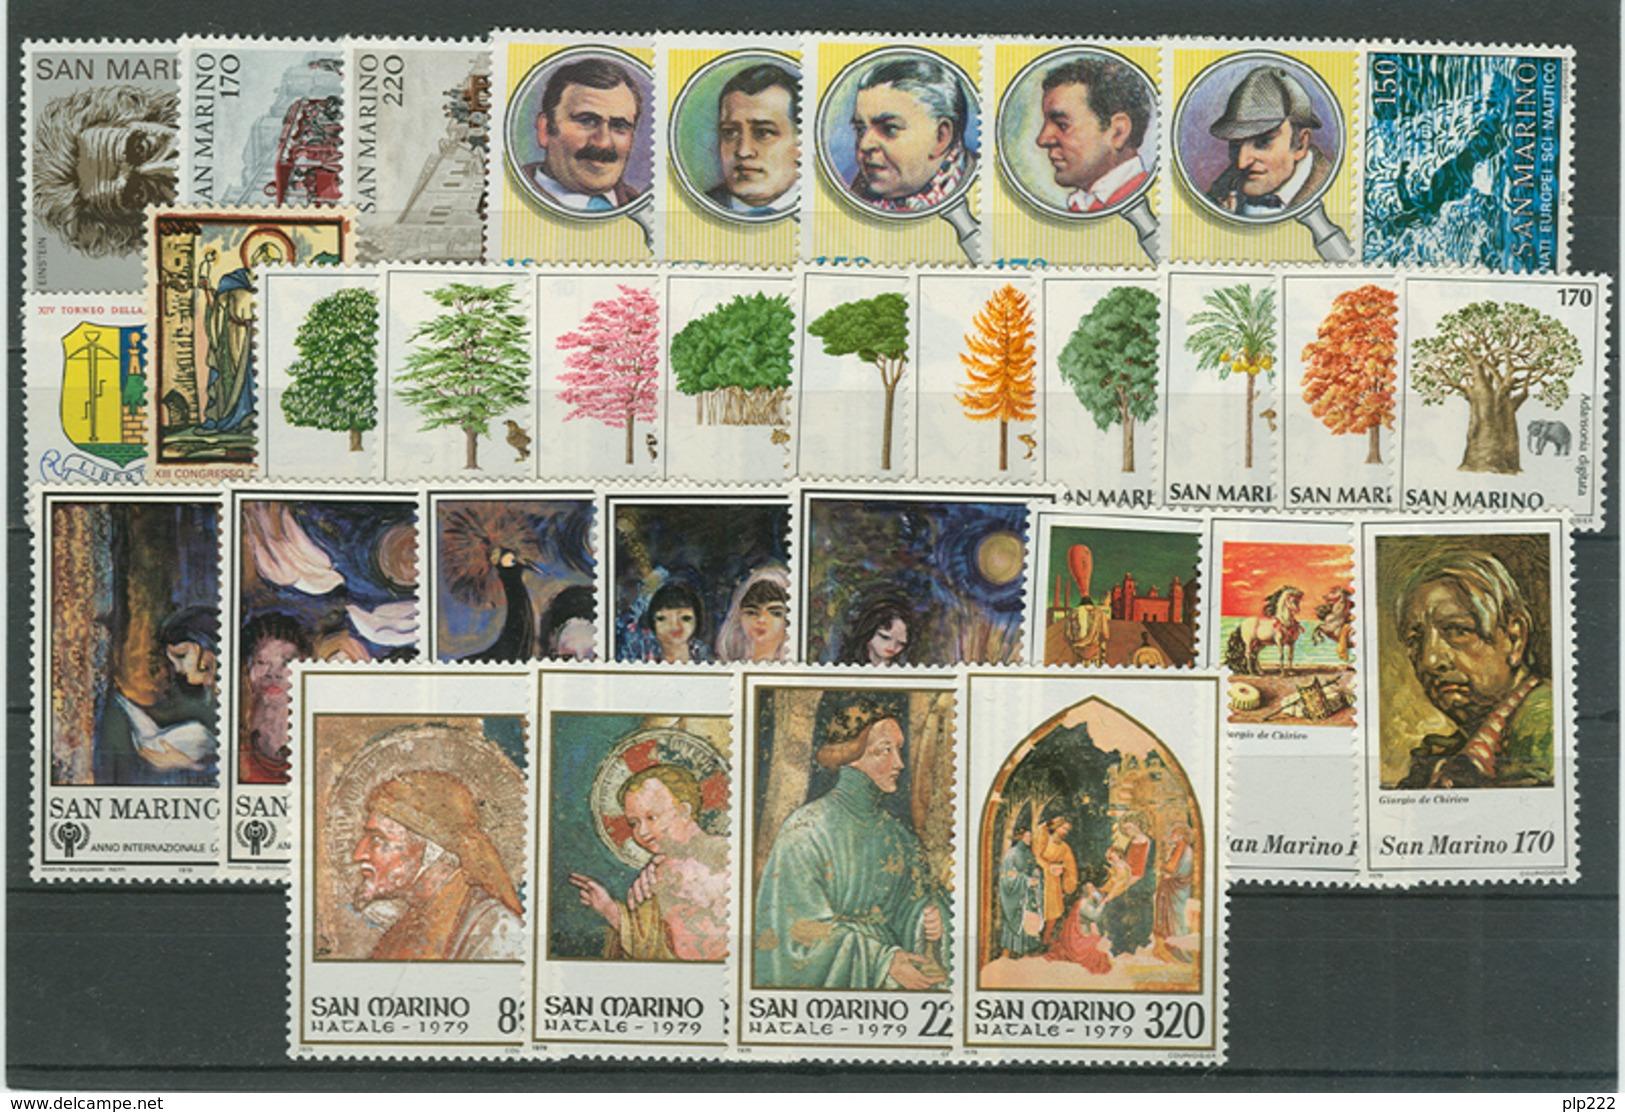 San Marino 1979 Annata Completa/Complete Year MNH/** - San Marino